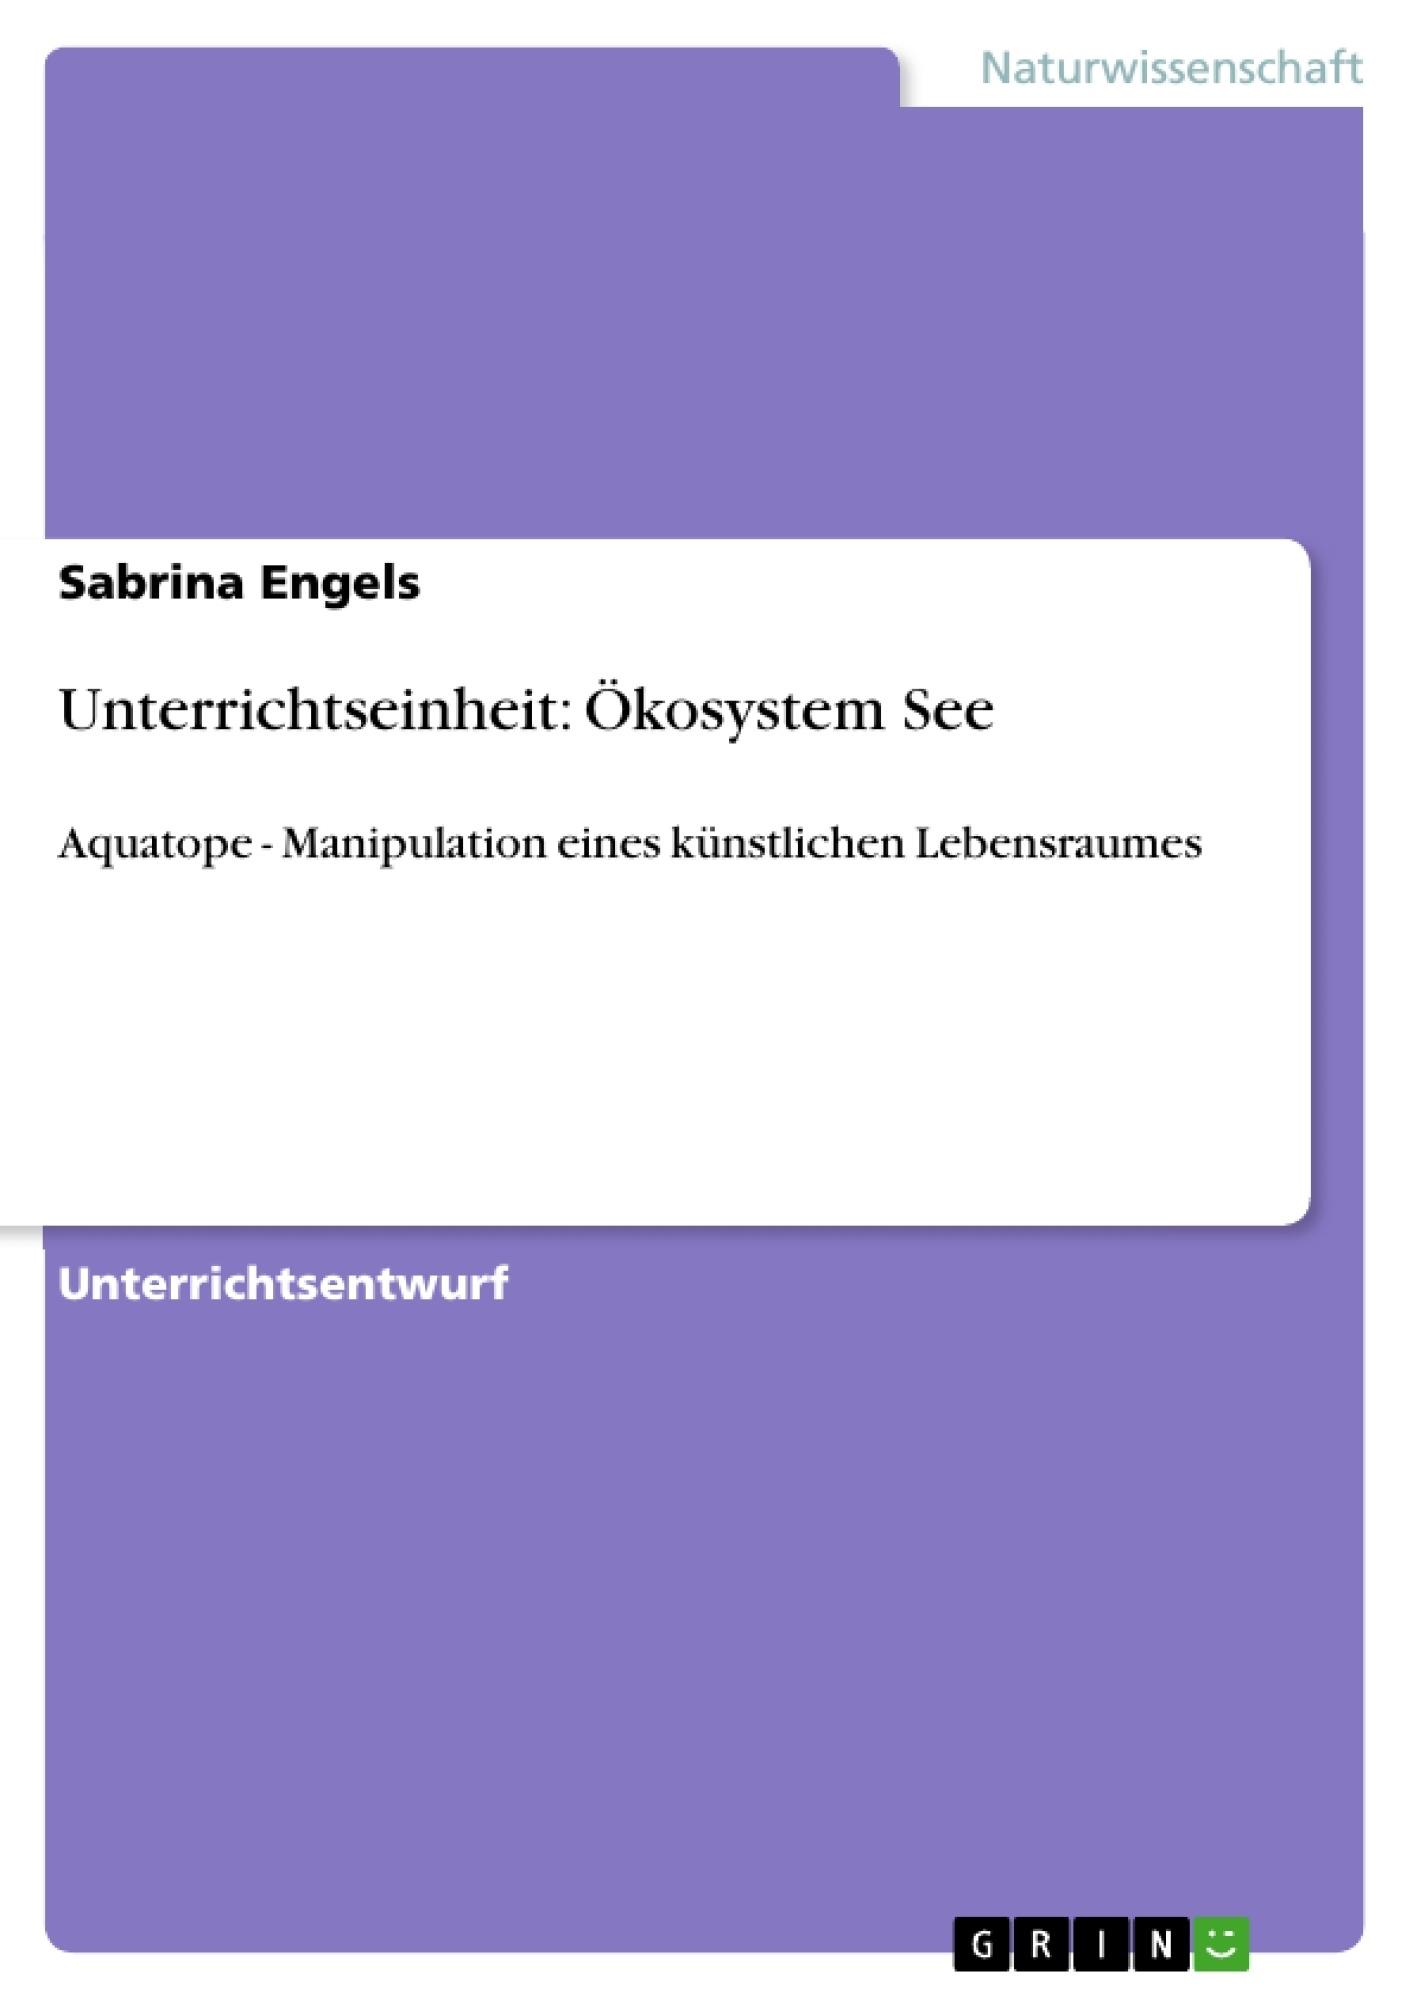 Titel: Unterrichtseinheit: Ökosystem See